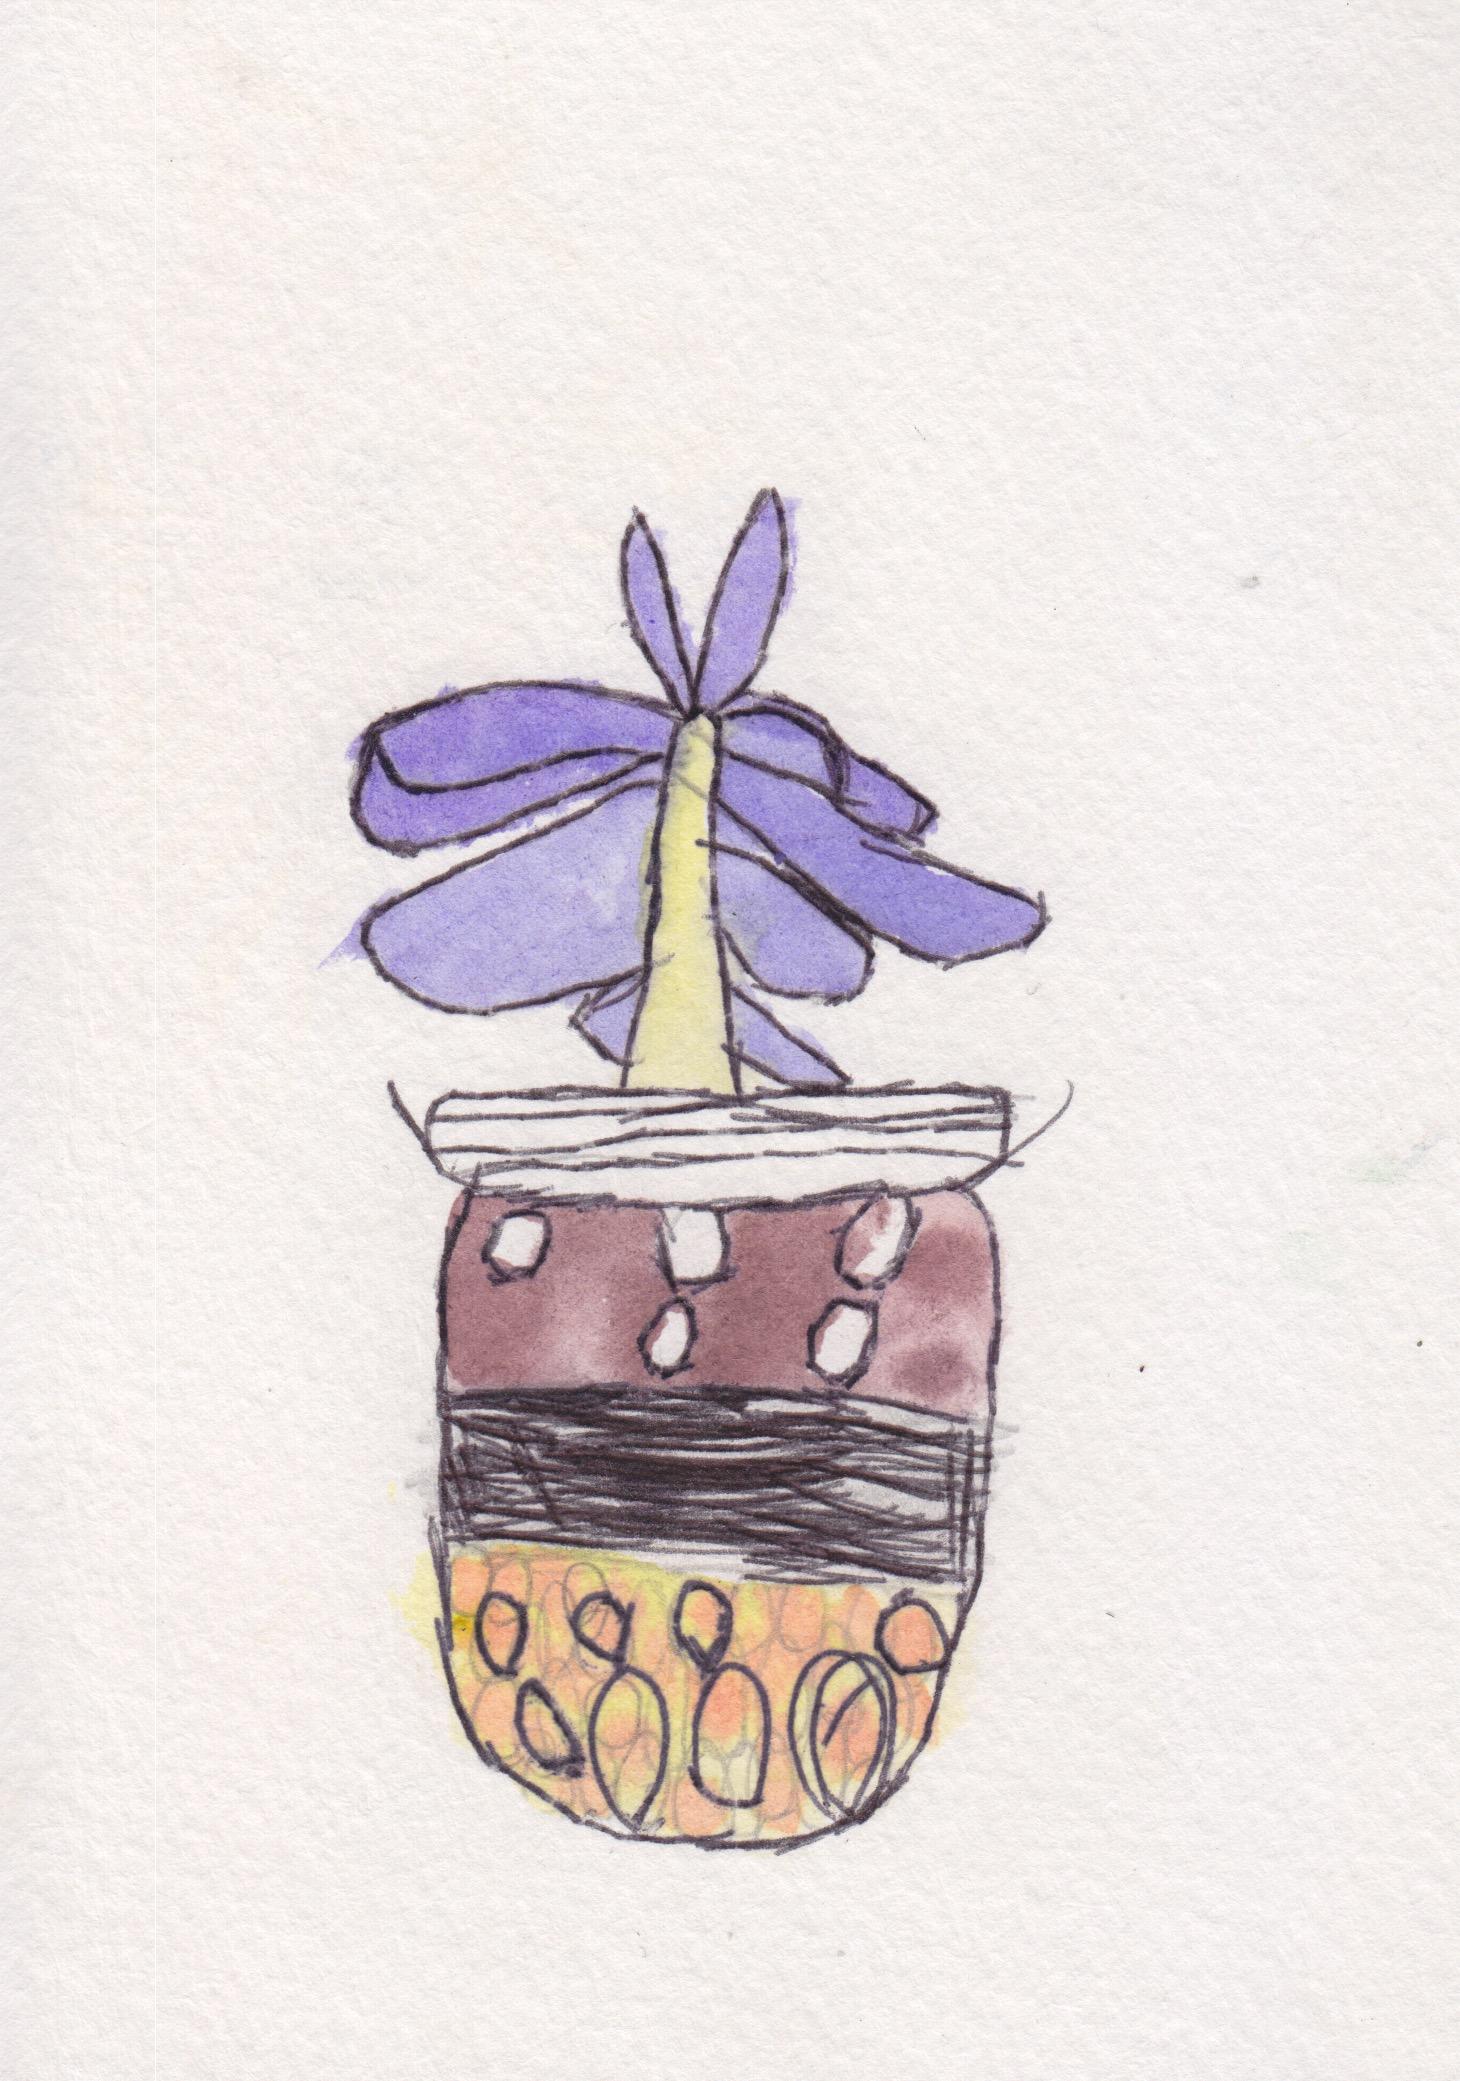 centro_watercolor terrarium_FelixPerez.jpeg